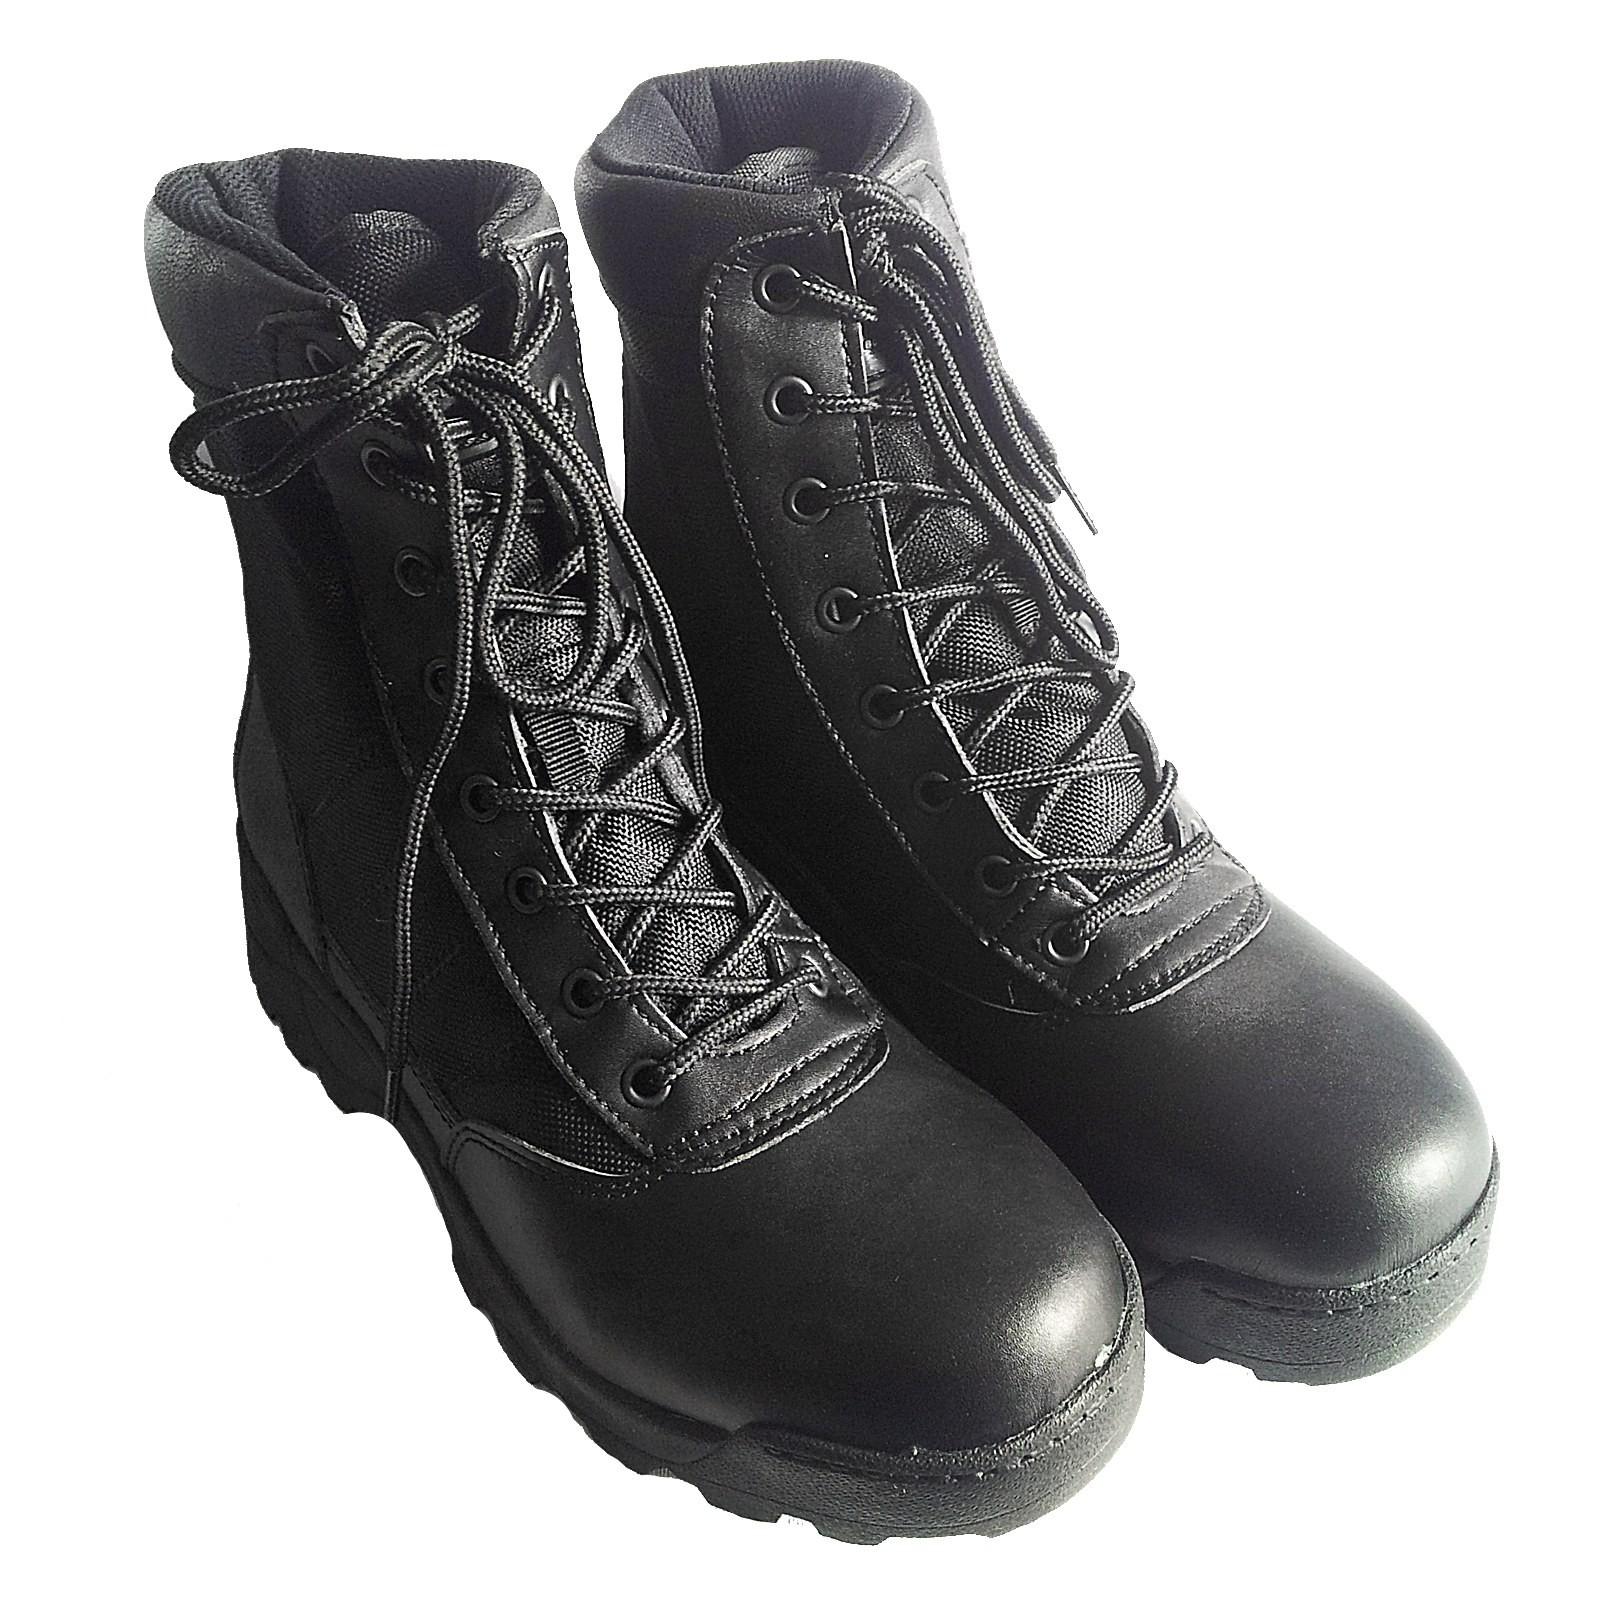 Anfibi Stivali Scarpe Scarponcini Trekking Softair Caccia Neri Taglia 41 Royal